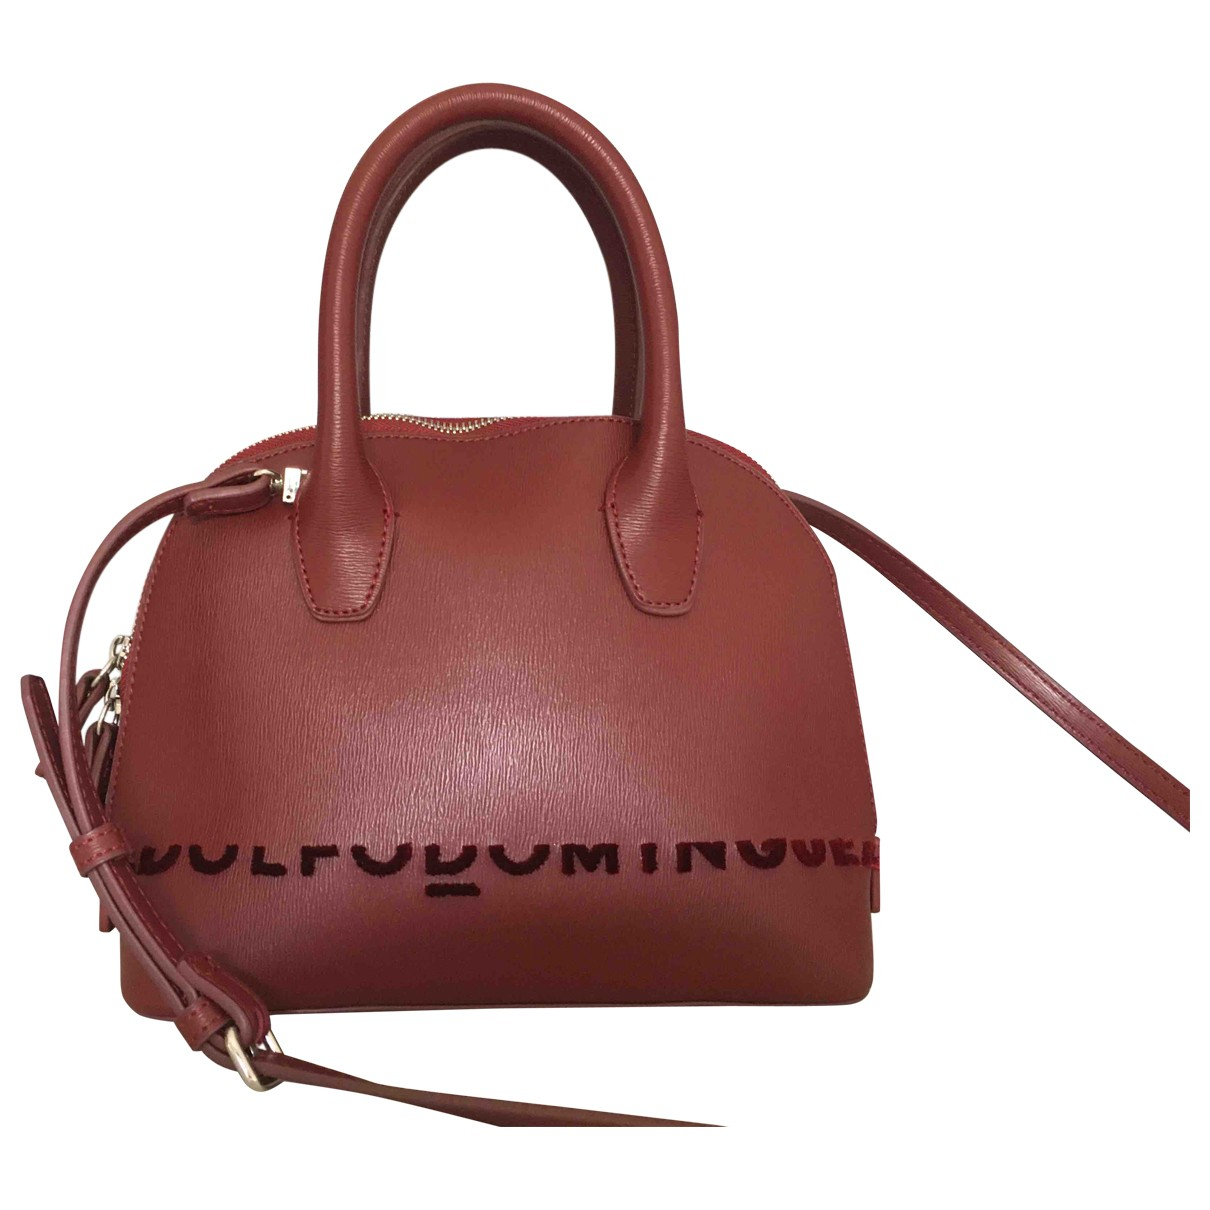 Adolfo Dominguez \N Handtasche in  Bordeauxrot Leder